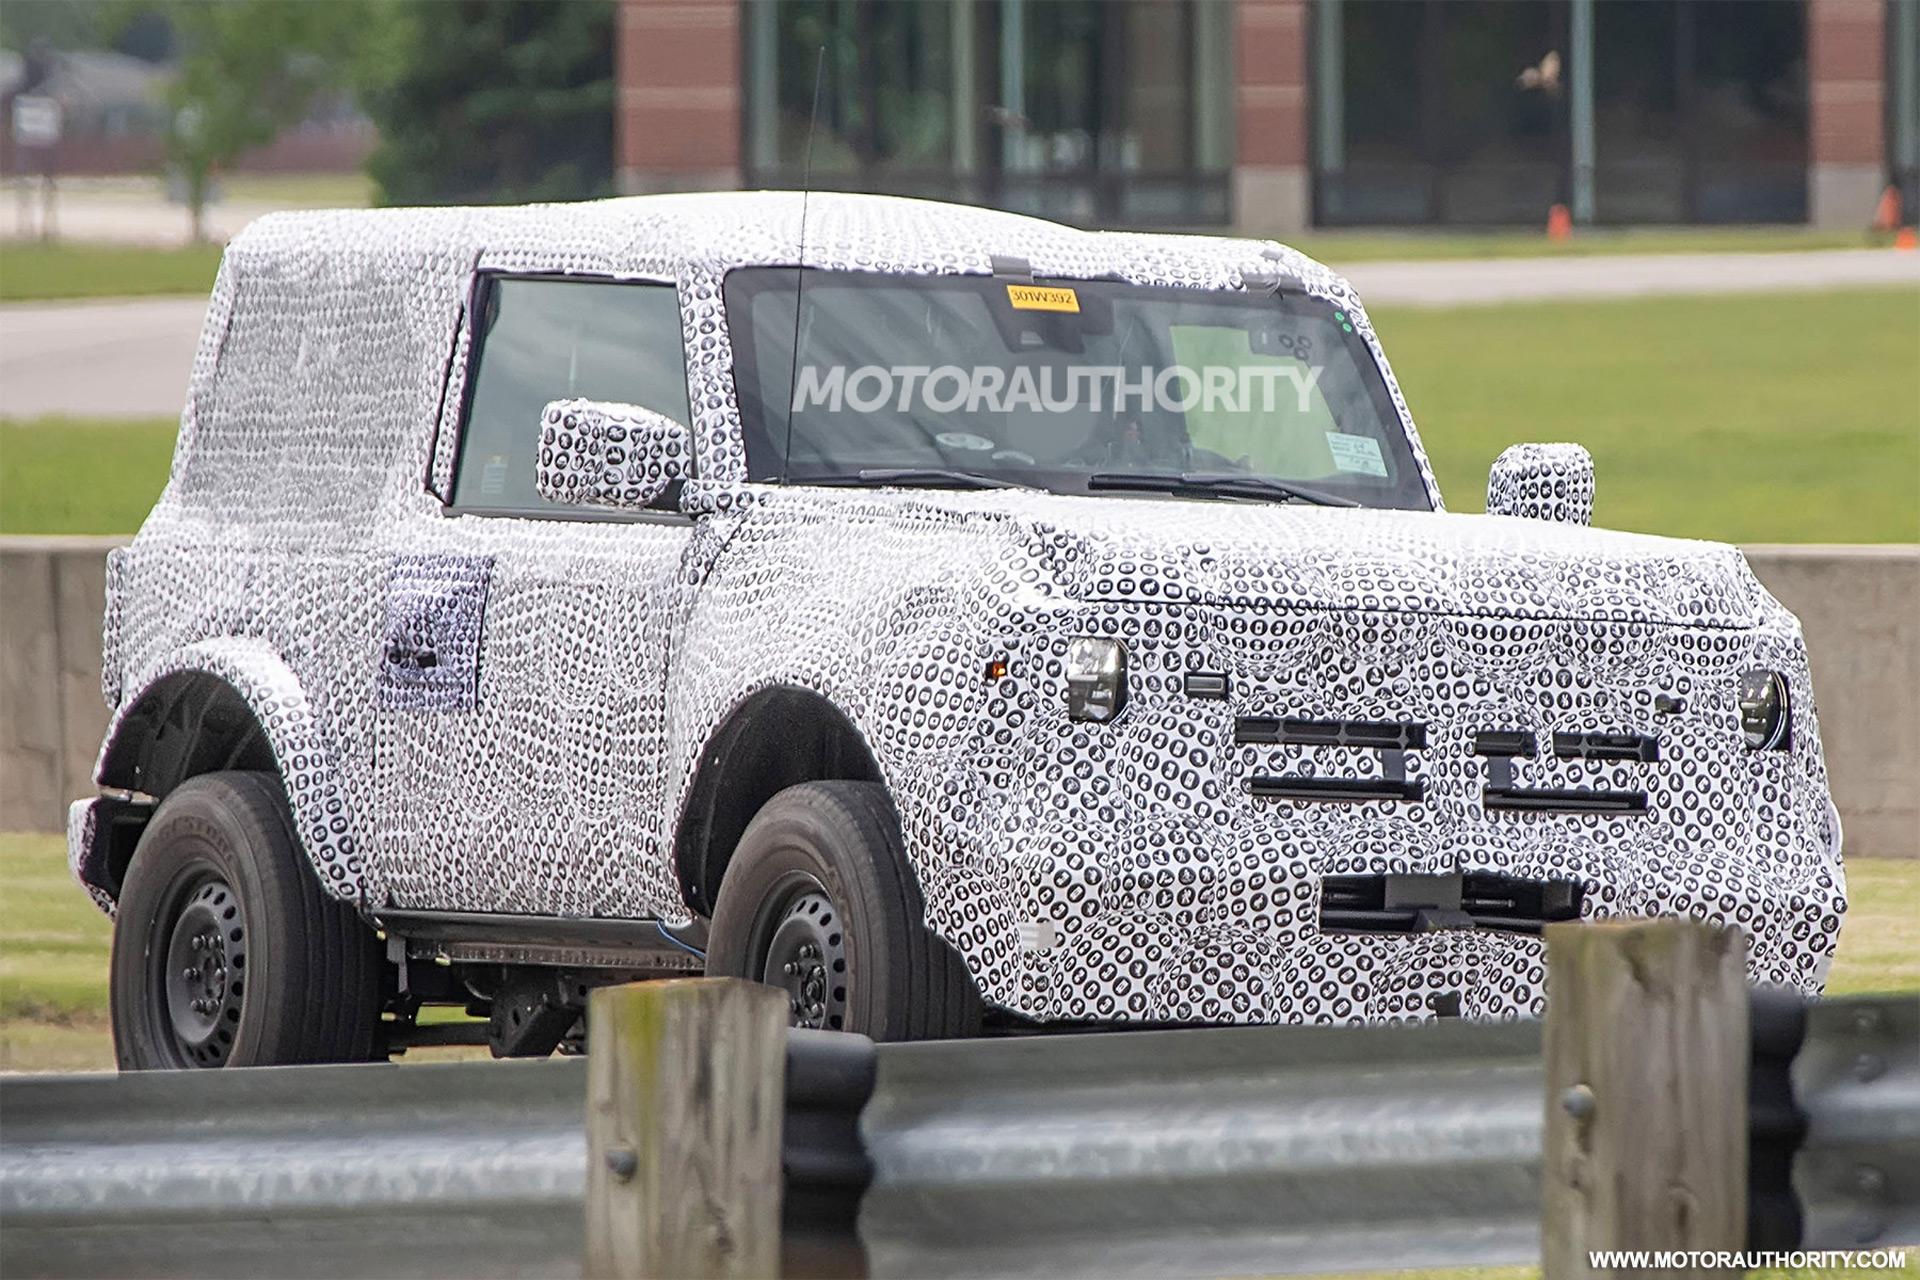 2021 Ford Bronco, electric BMW M5, future of Infiniti: Car News Headlines